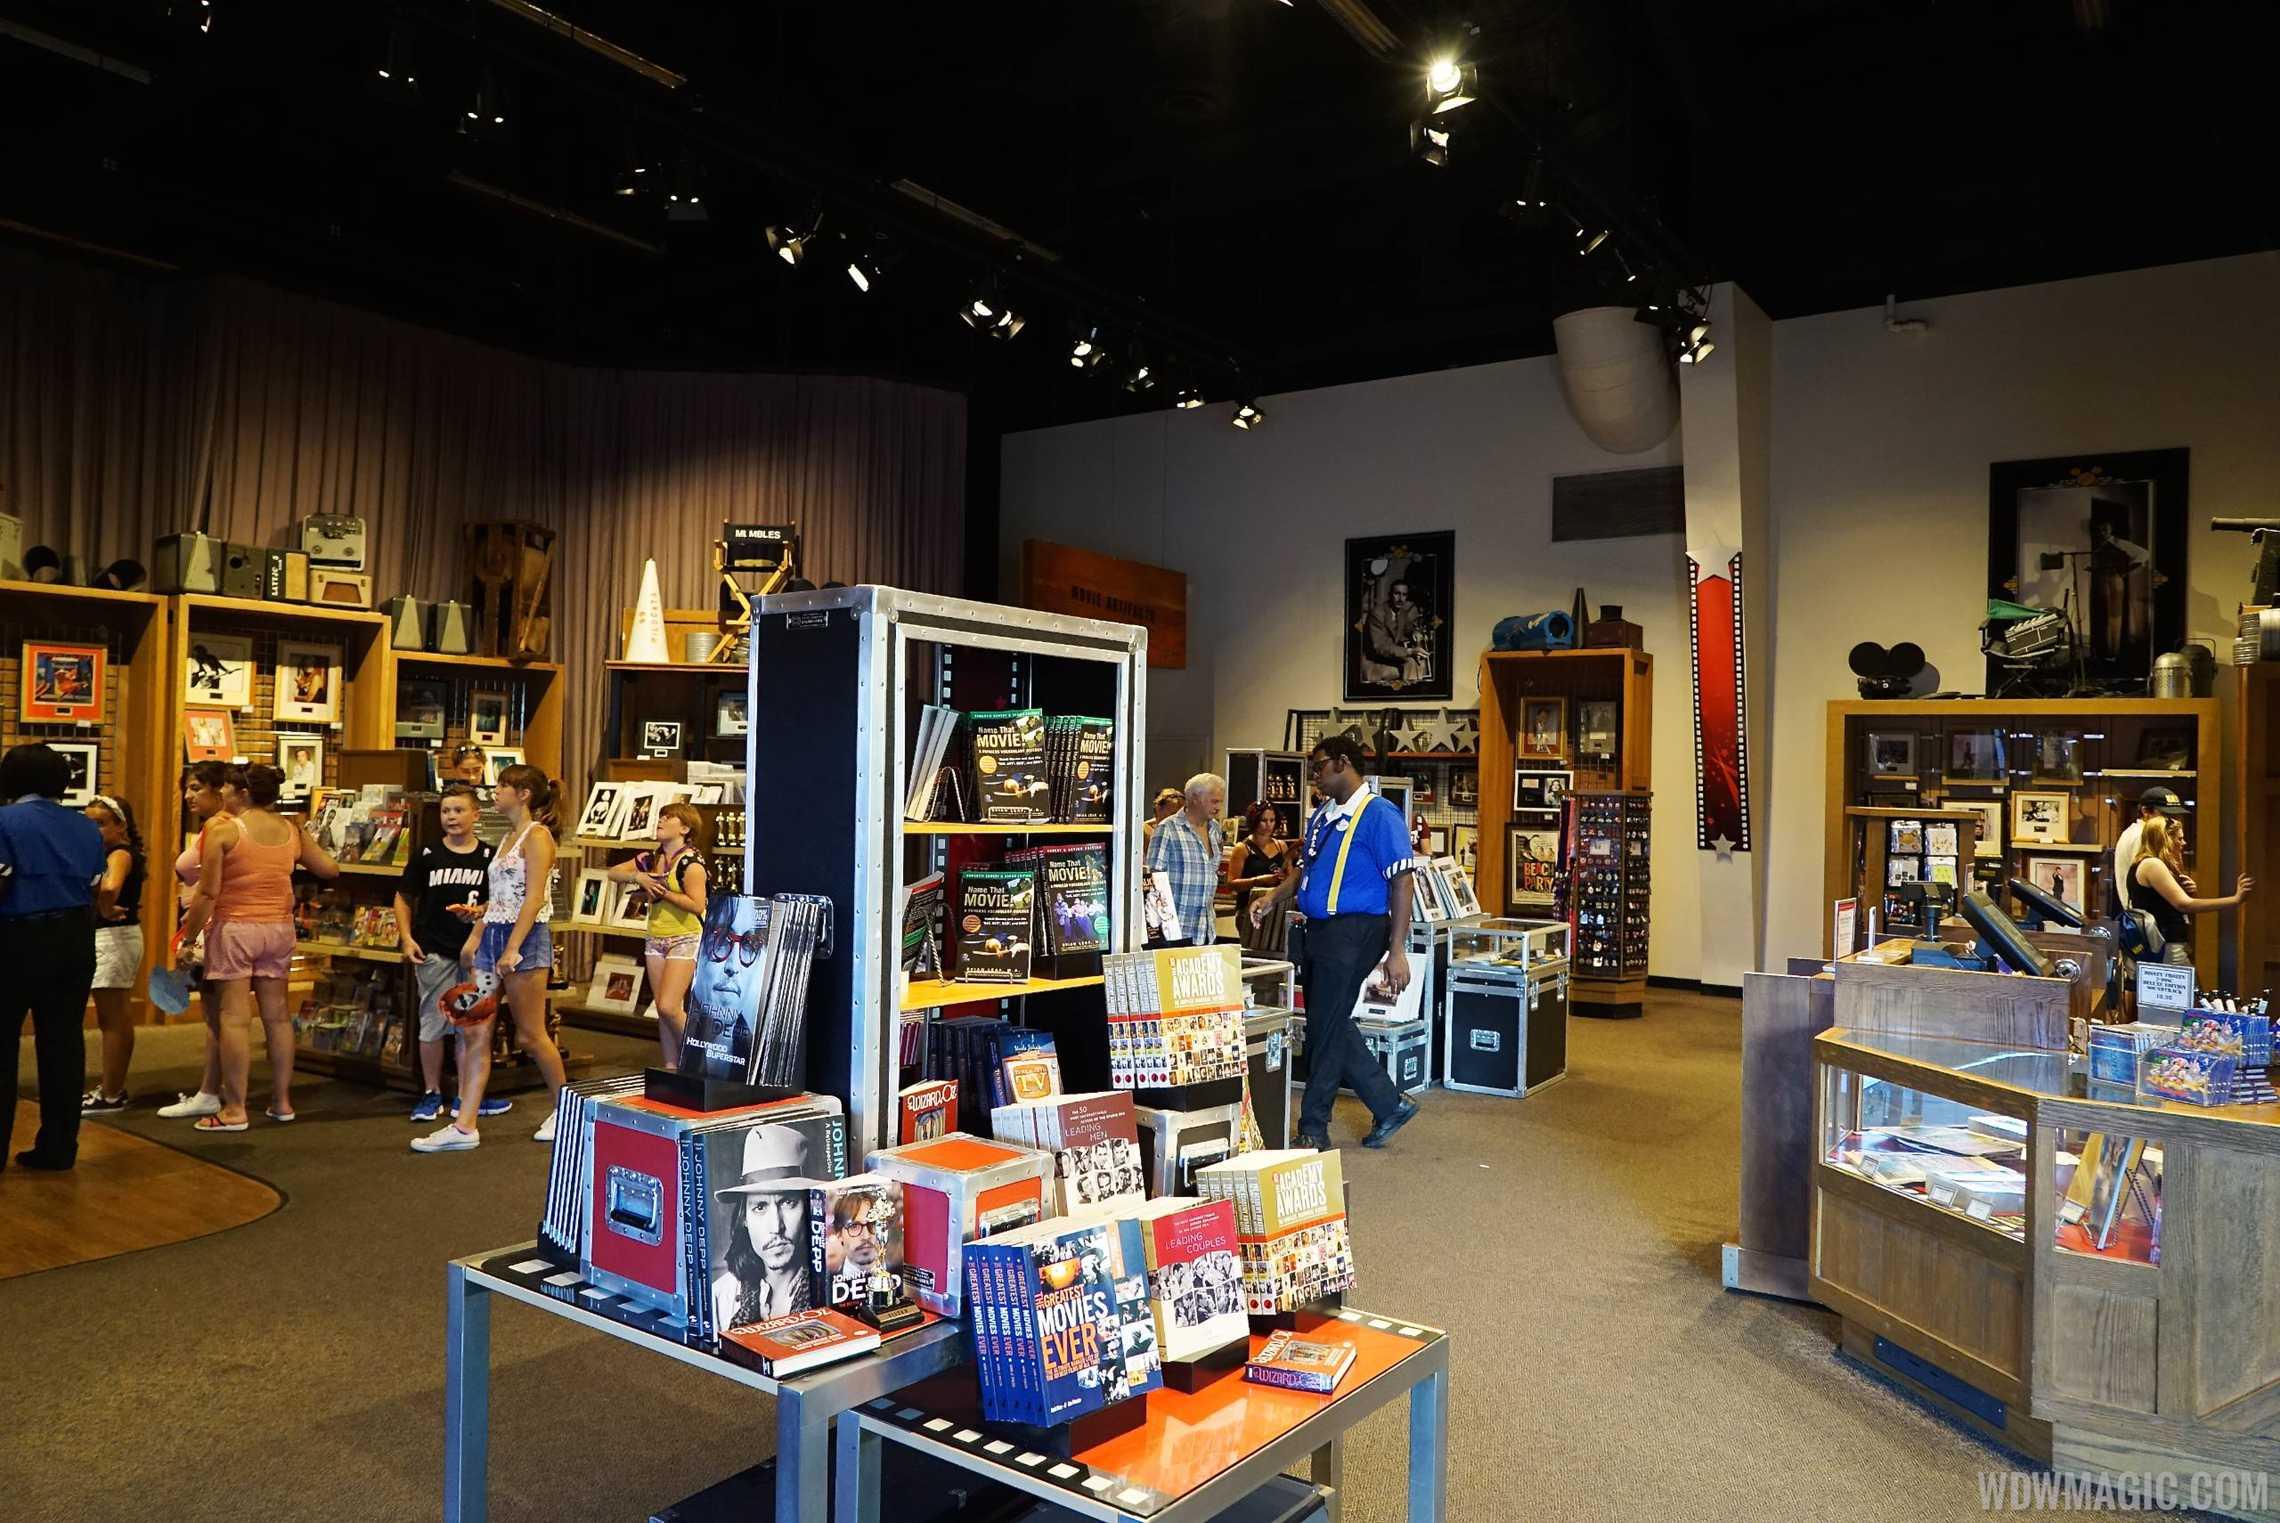 American Film Institute exhibit - Inside the Showcase Shop